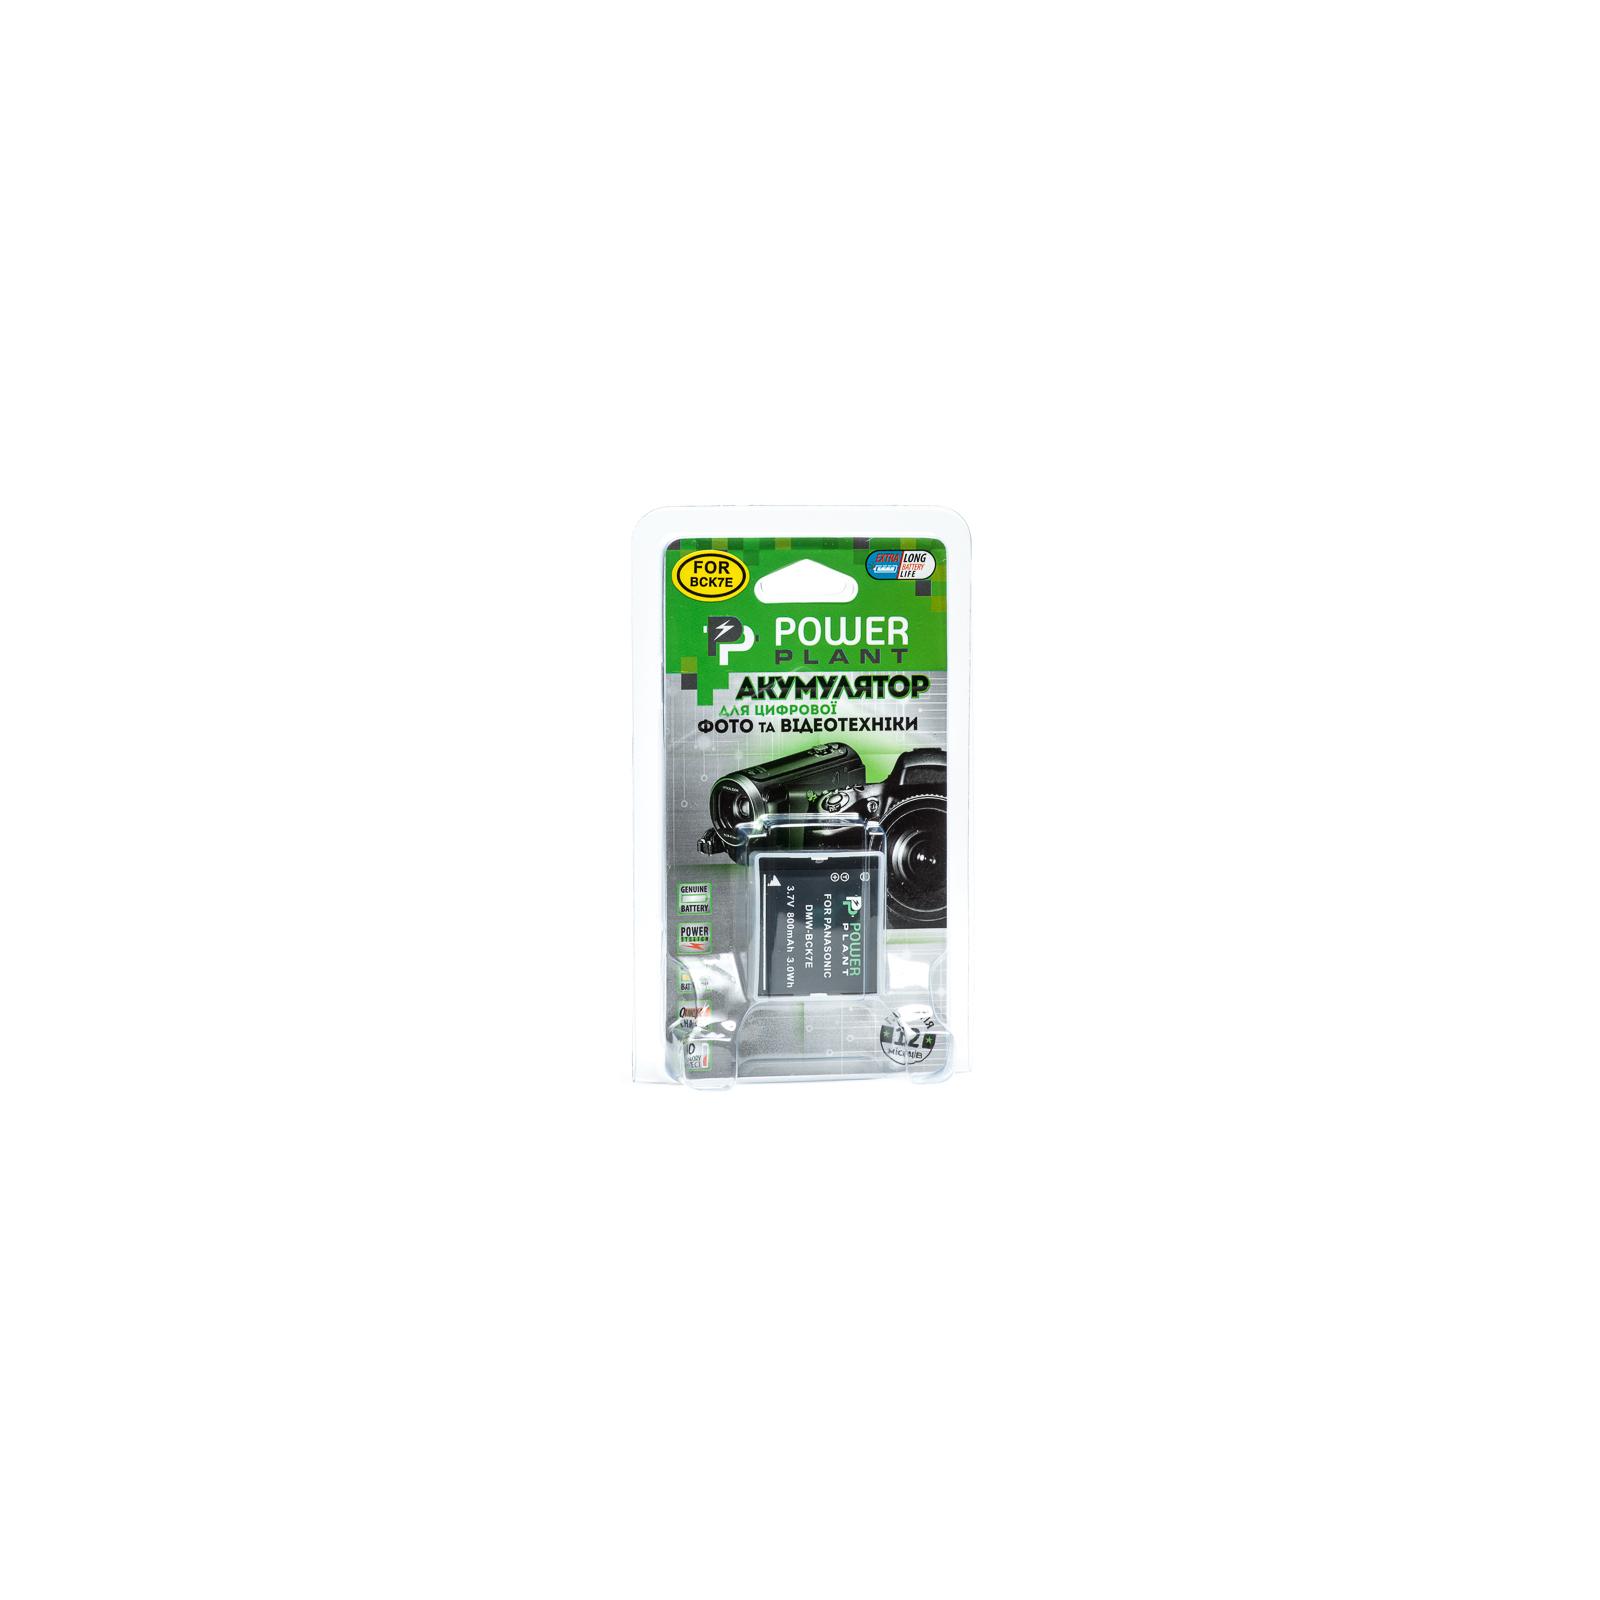 Аккумулятор к фото/видео PowerPlant Panasonic DMW-BCK7E (DV00DV1301) изображение 3